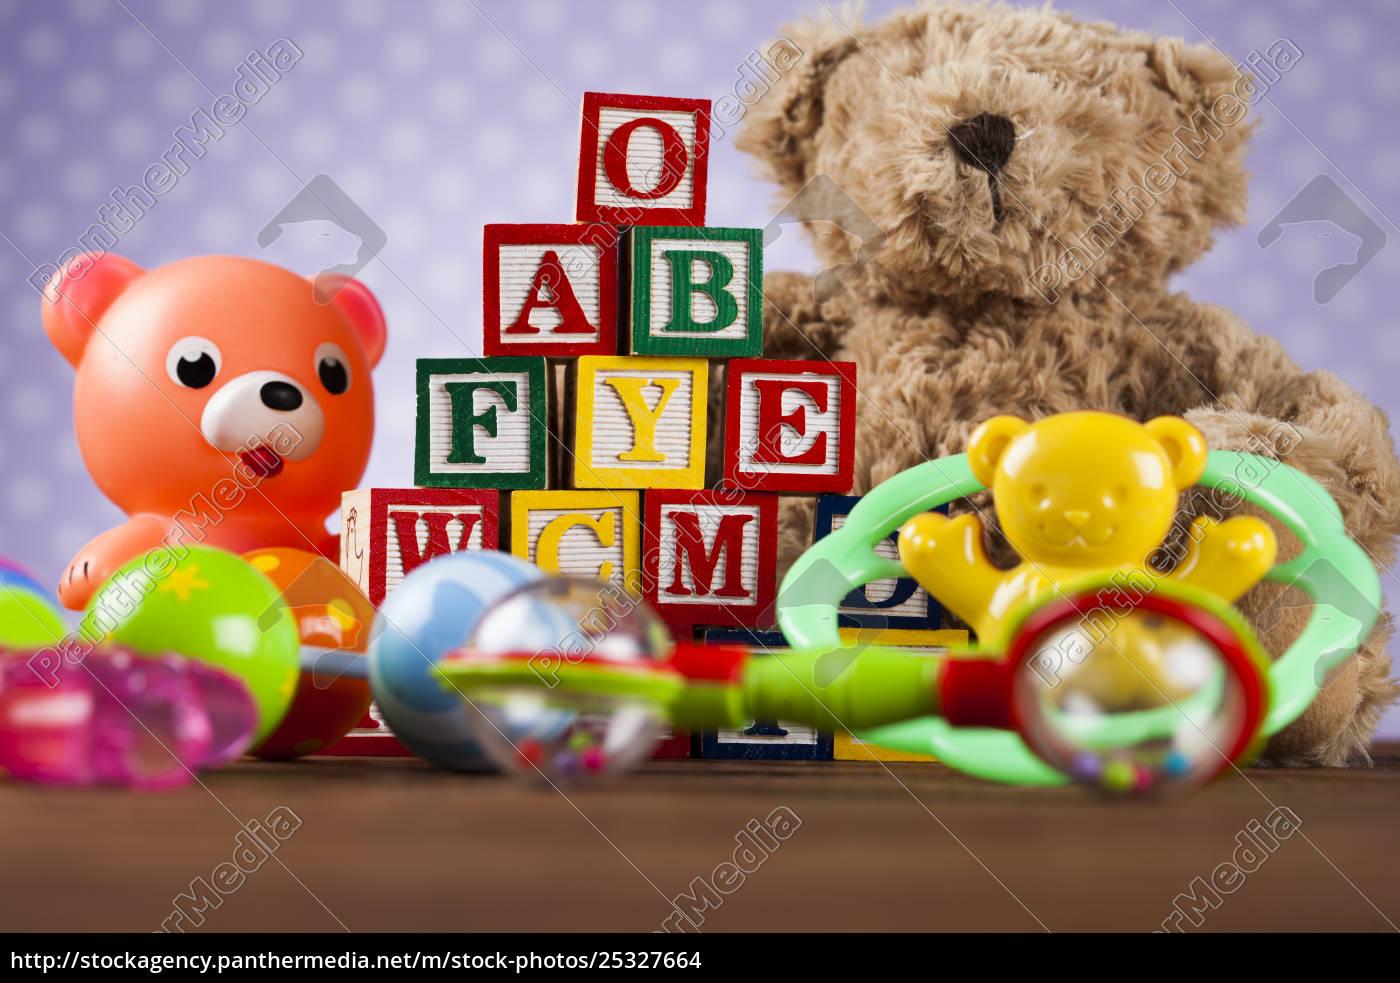 children's, of, toy, accessories, on, wooden - 25327664